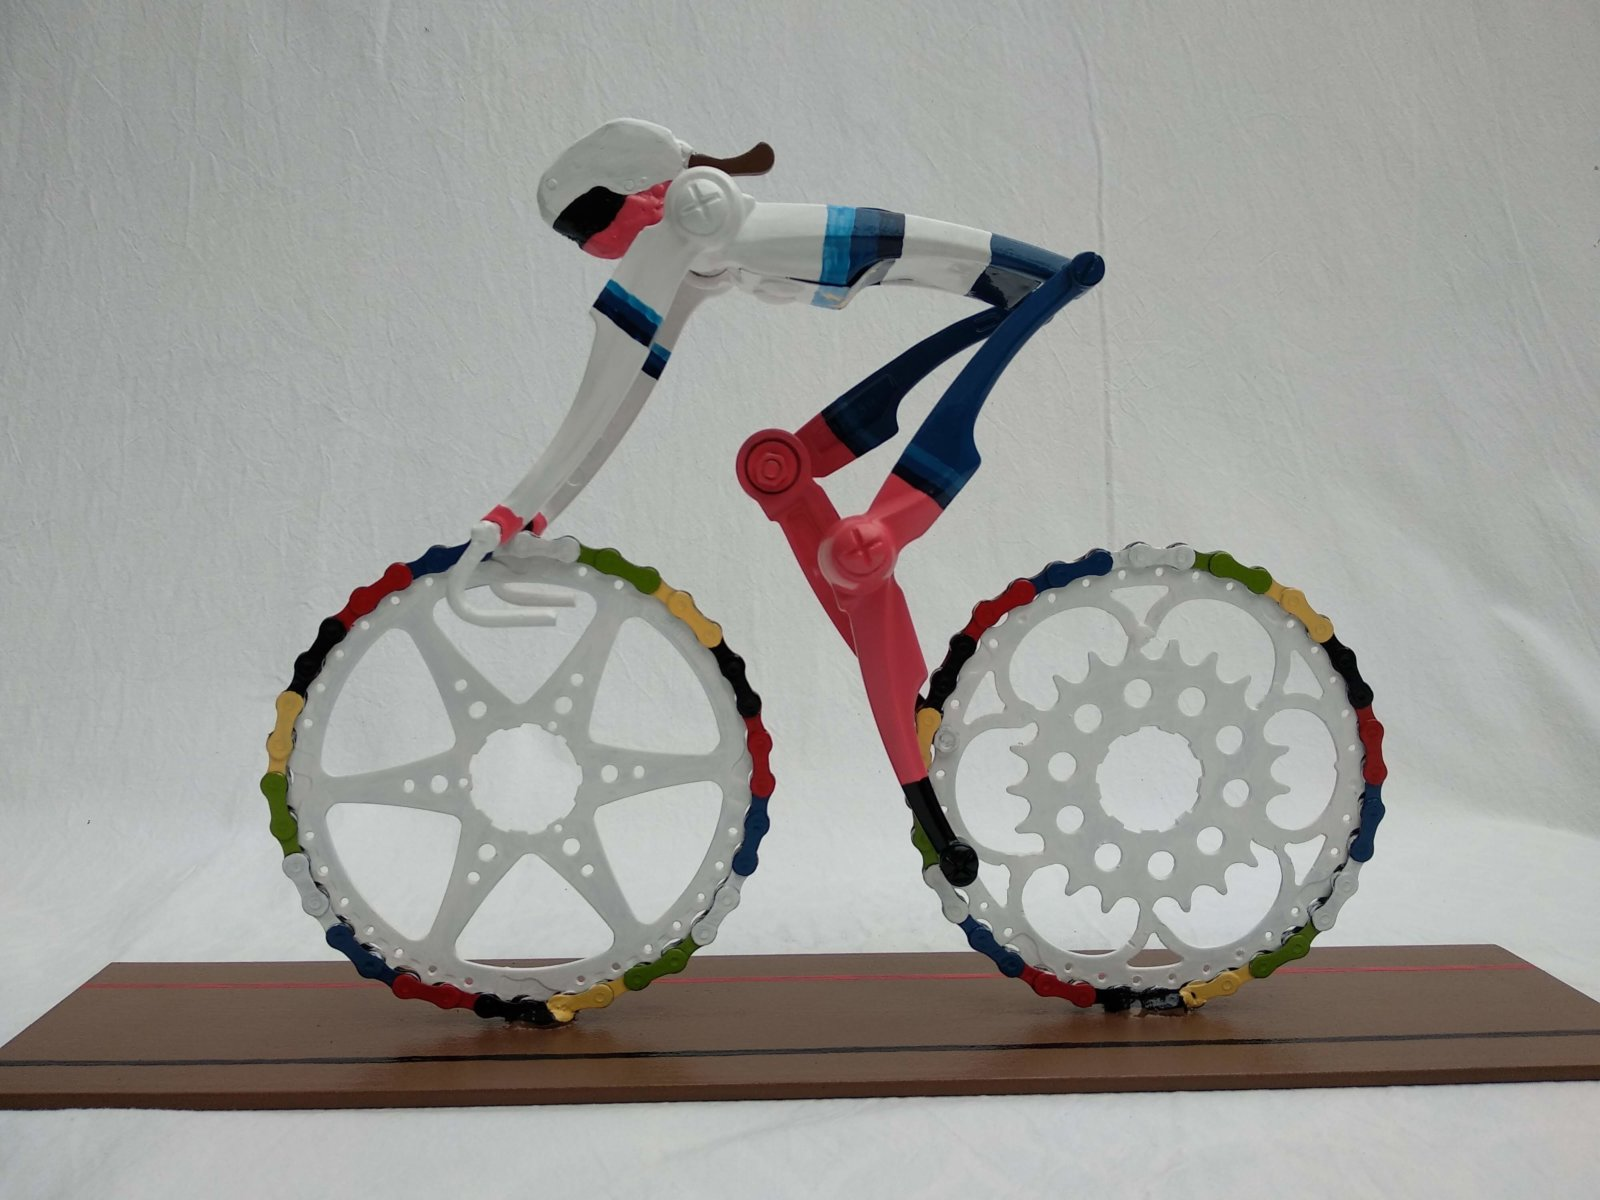 Cyclingart Female Cyclist Champion Europe Road Track Cycling Decreatievelink